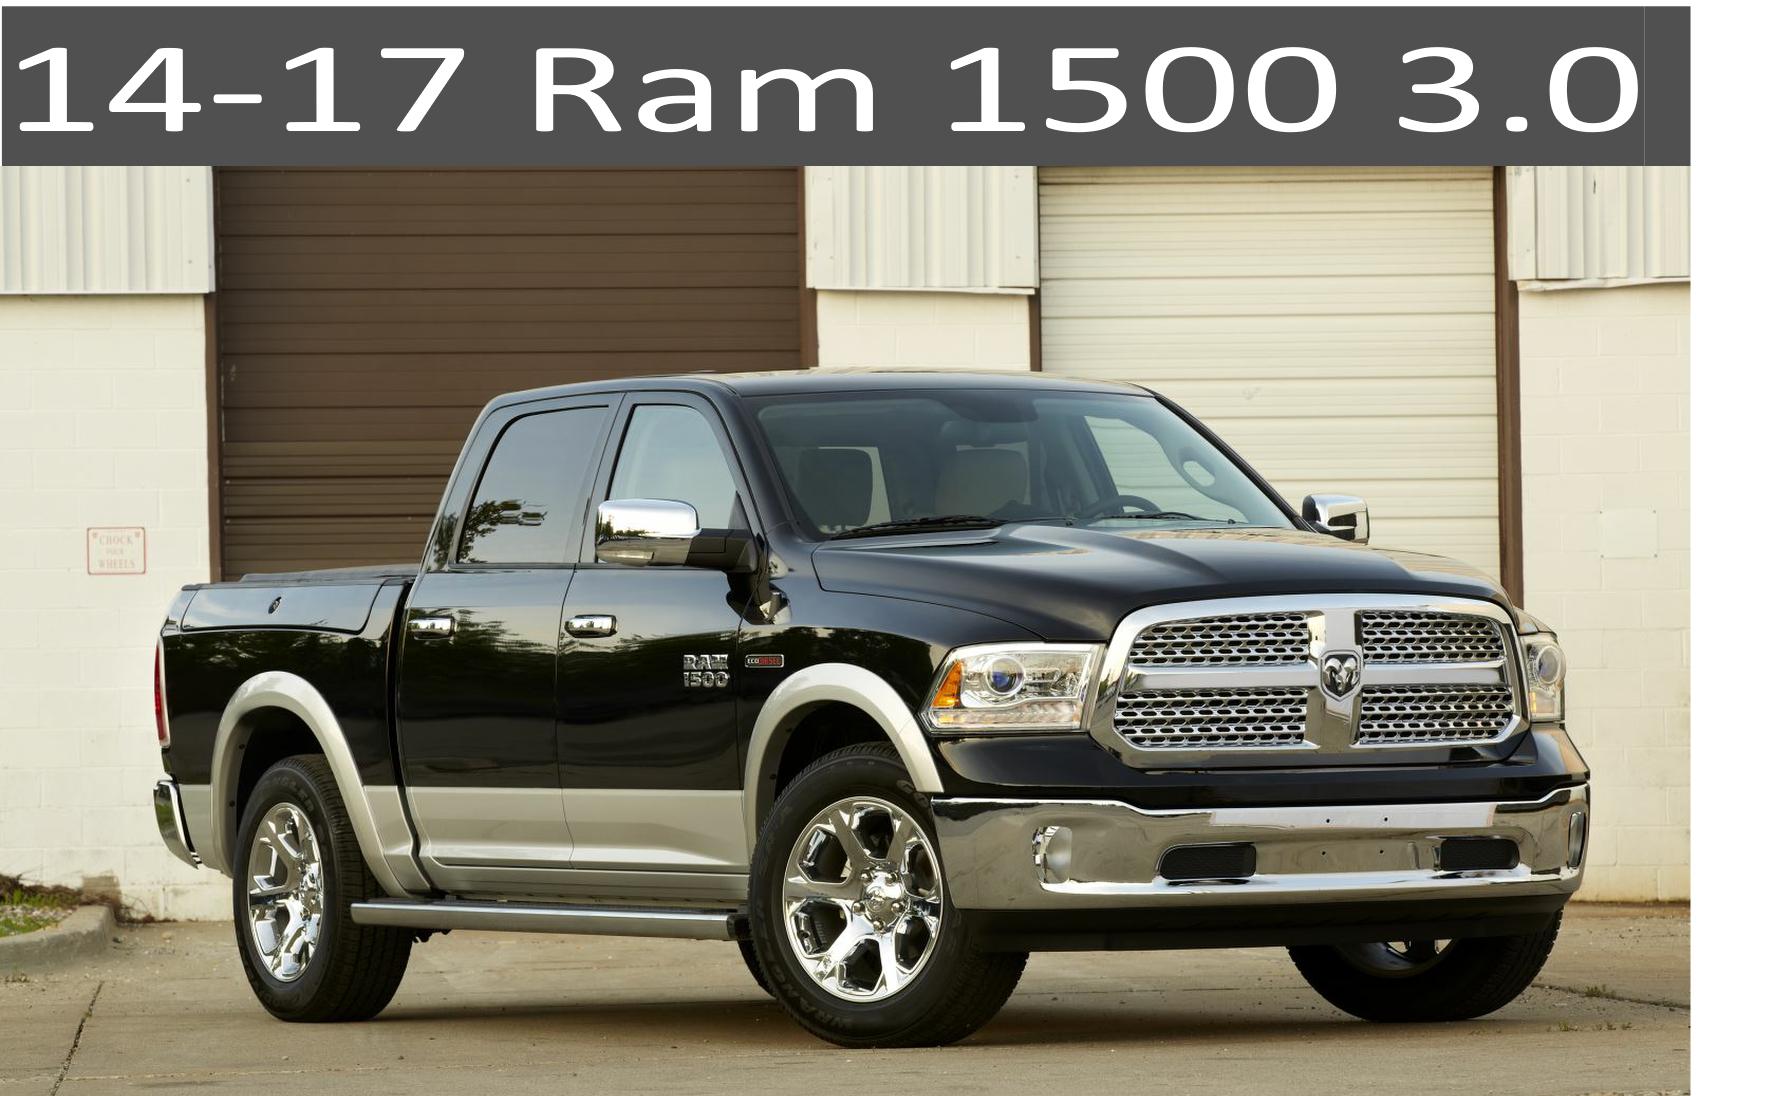 14-17 Dodge Ram 1500 3.0 Eco Diesel Parts